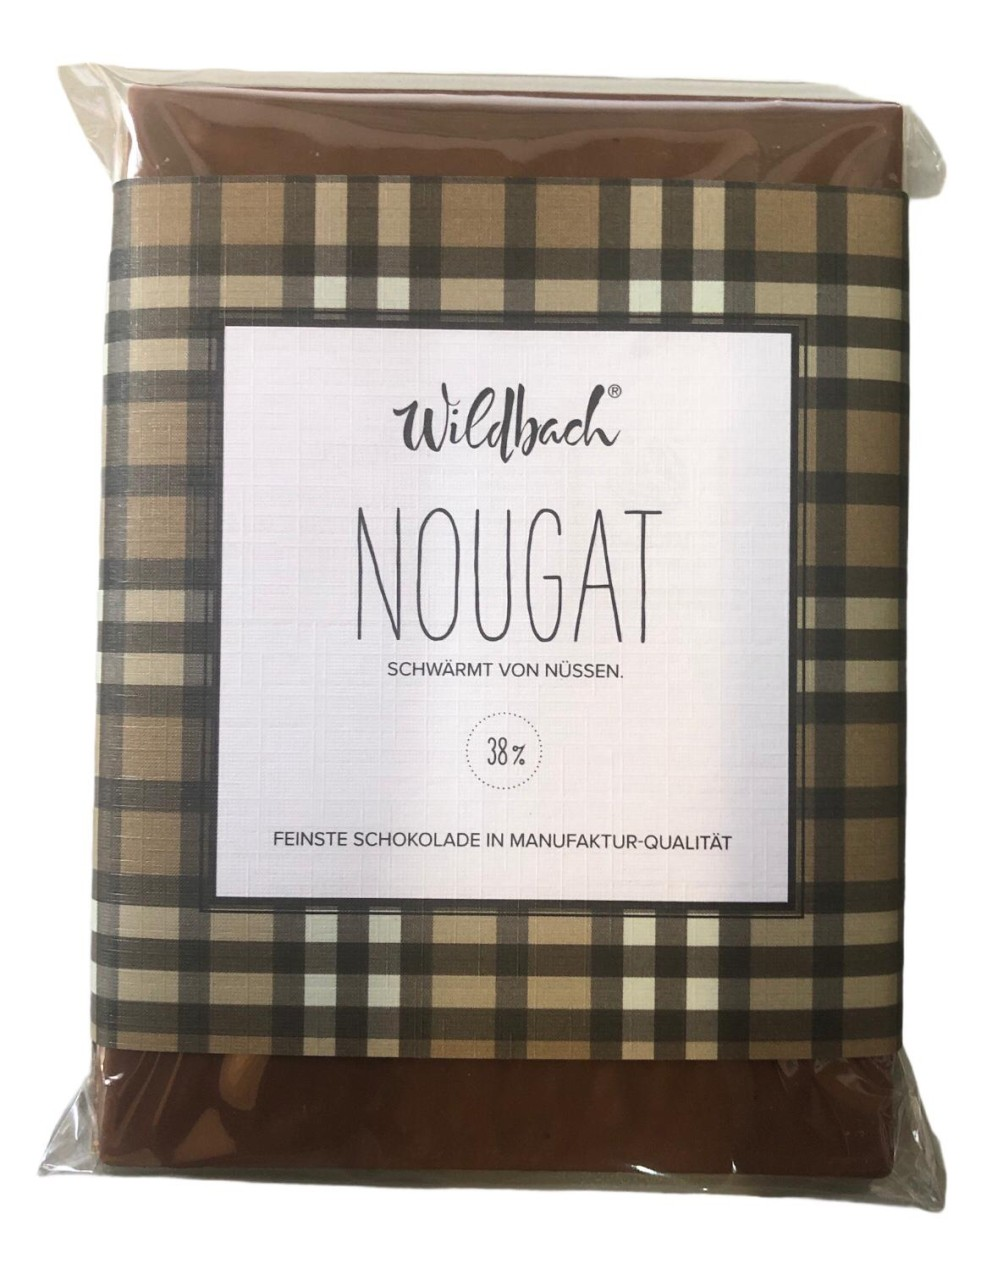 Wildbach Nougat 38% 70g